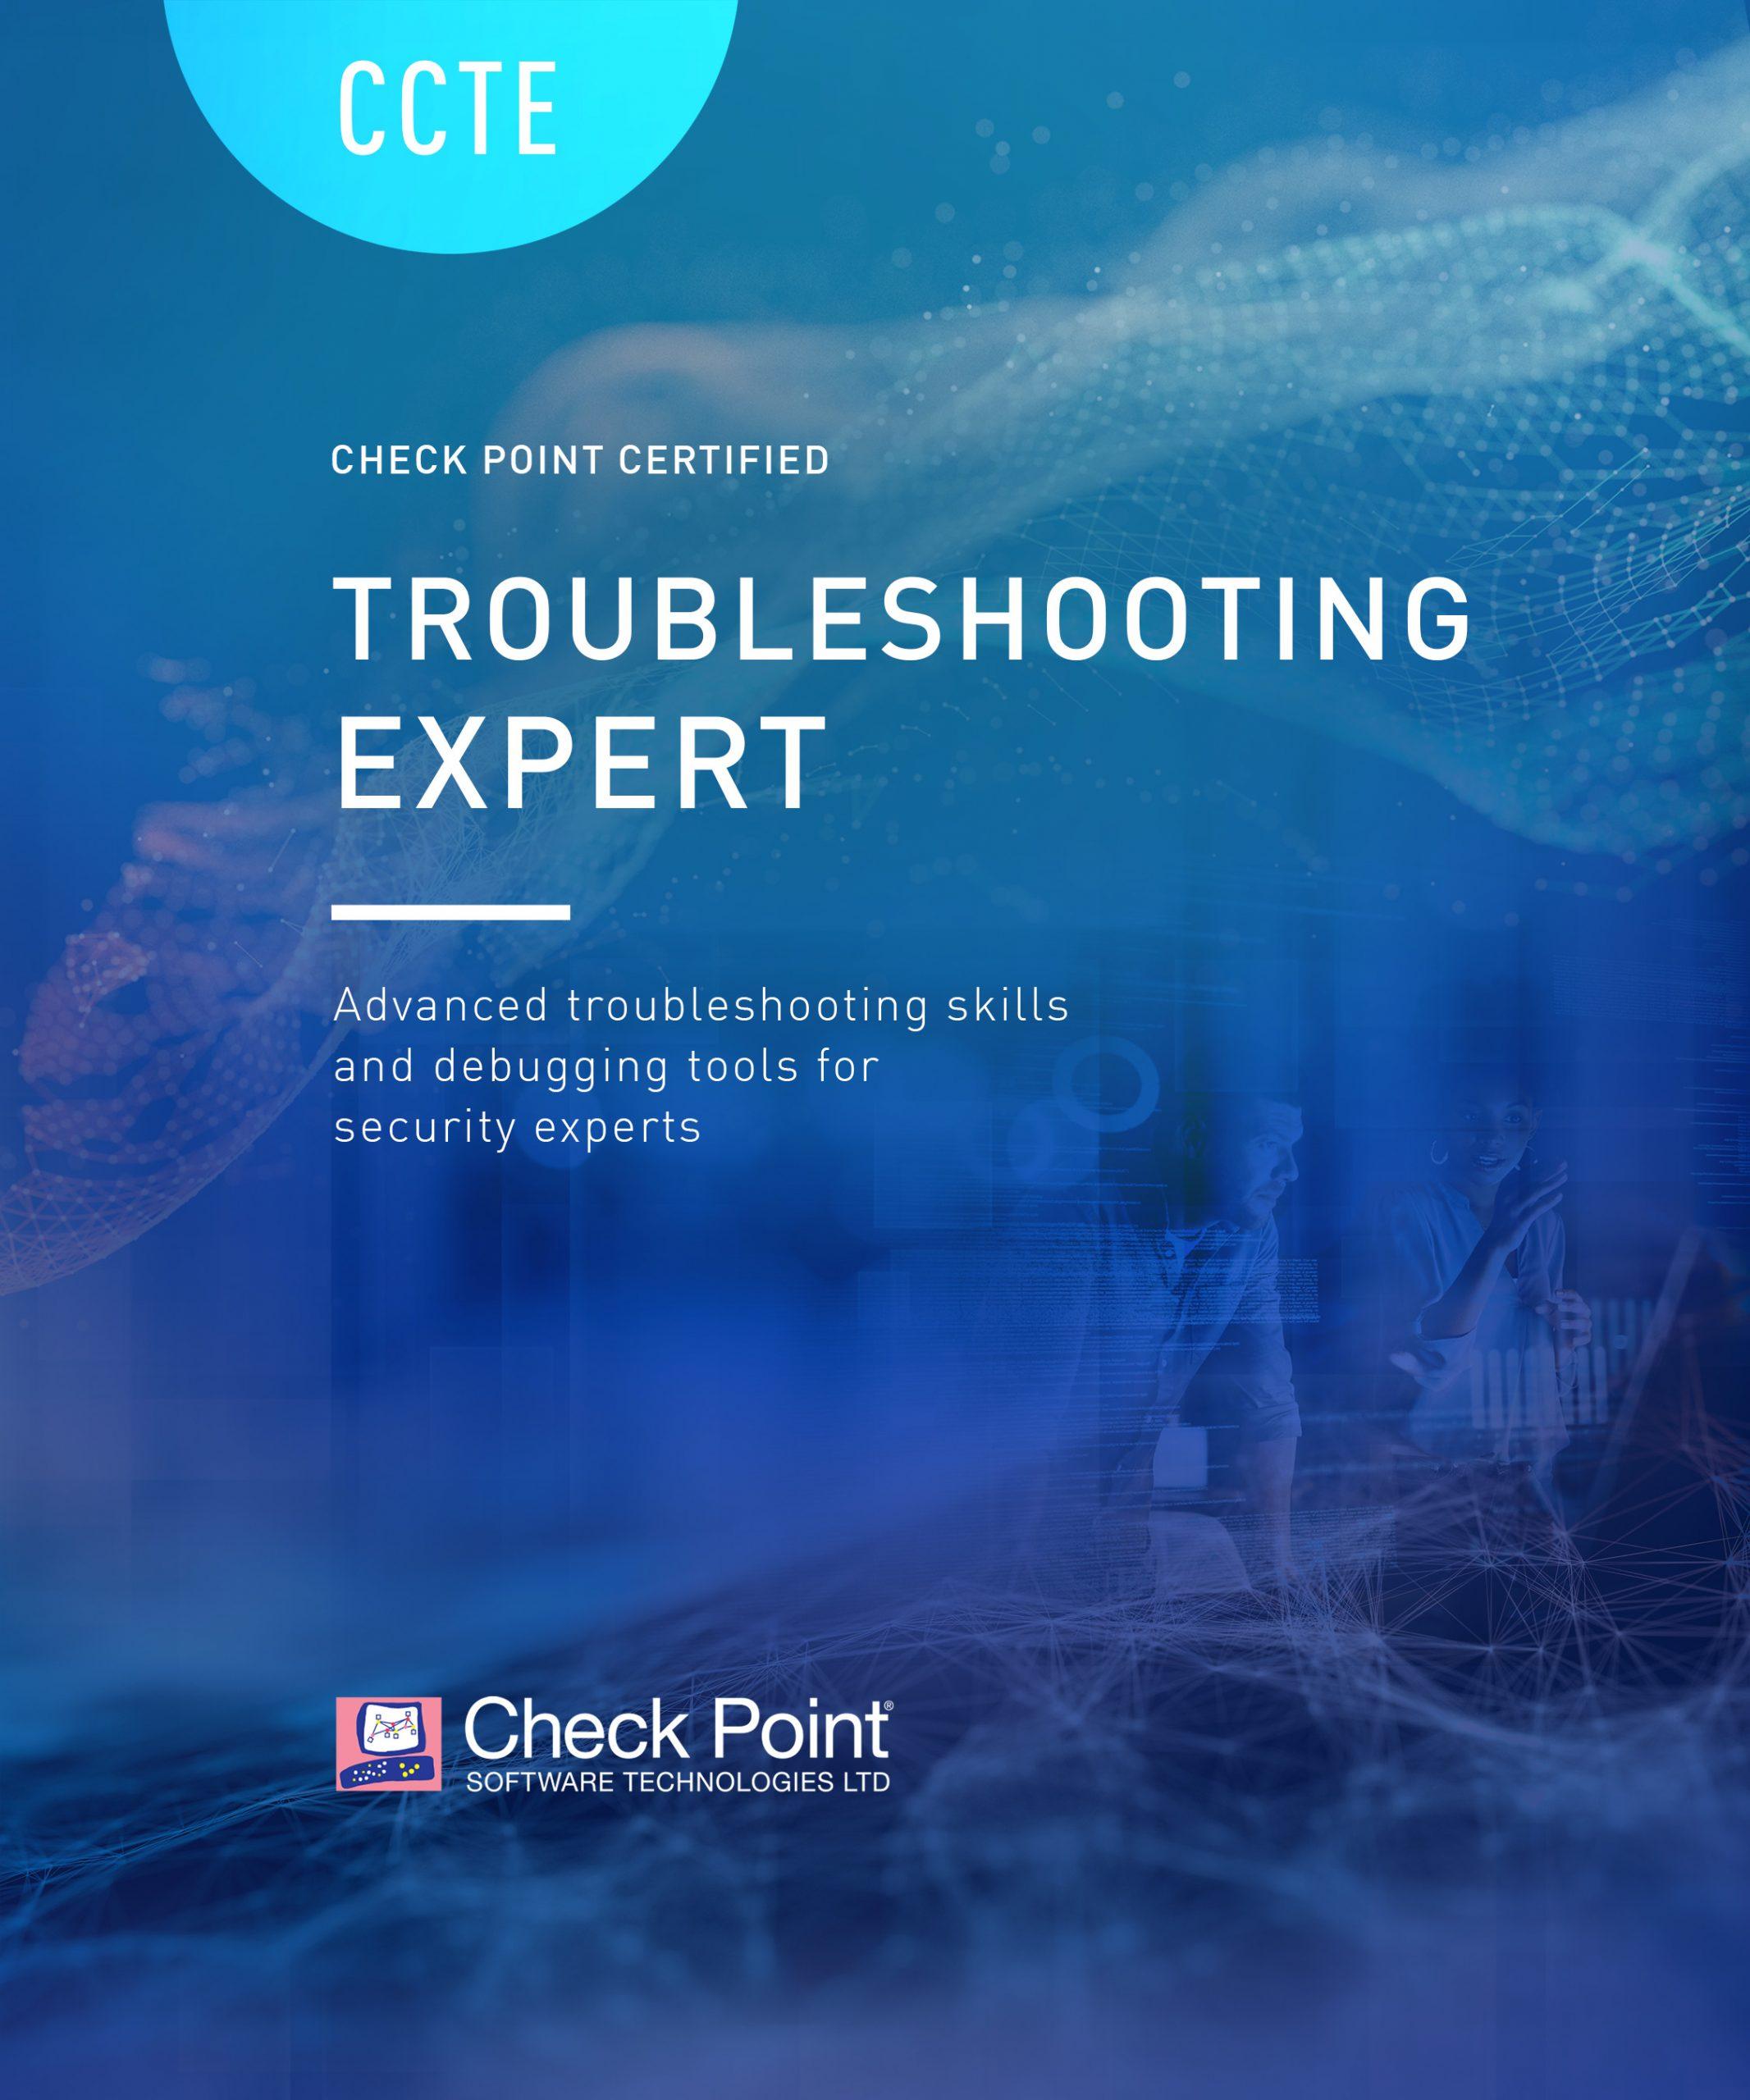 CCTE – Check Point Troubleshooting Expert (CCTE)